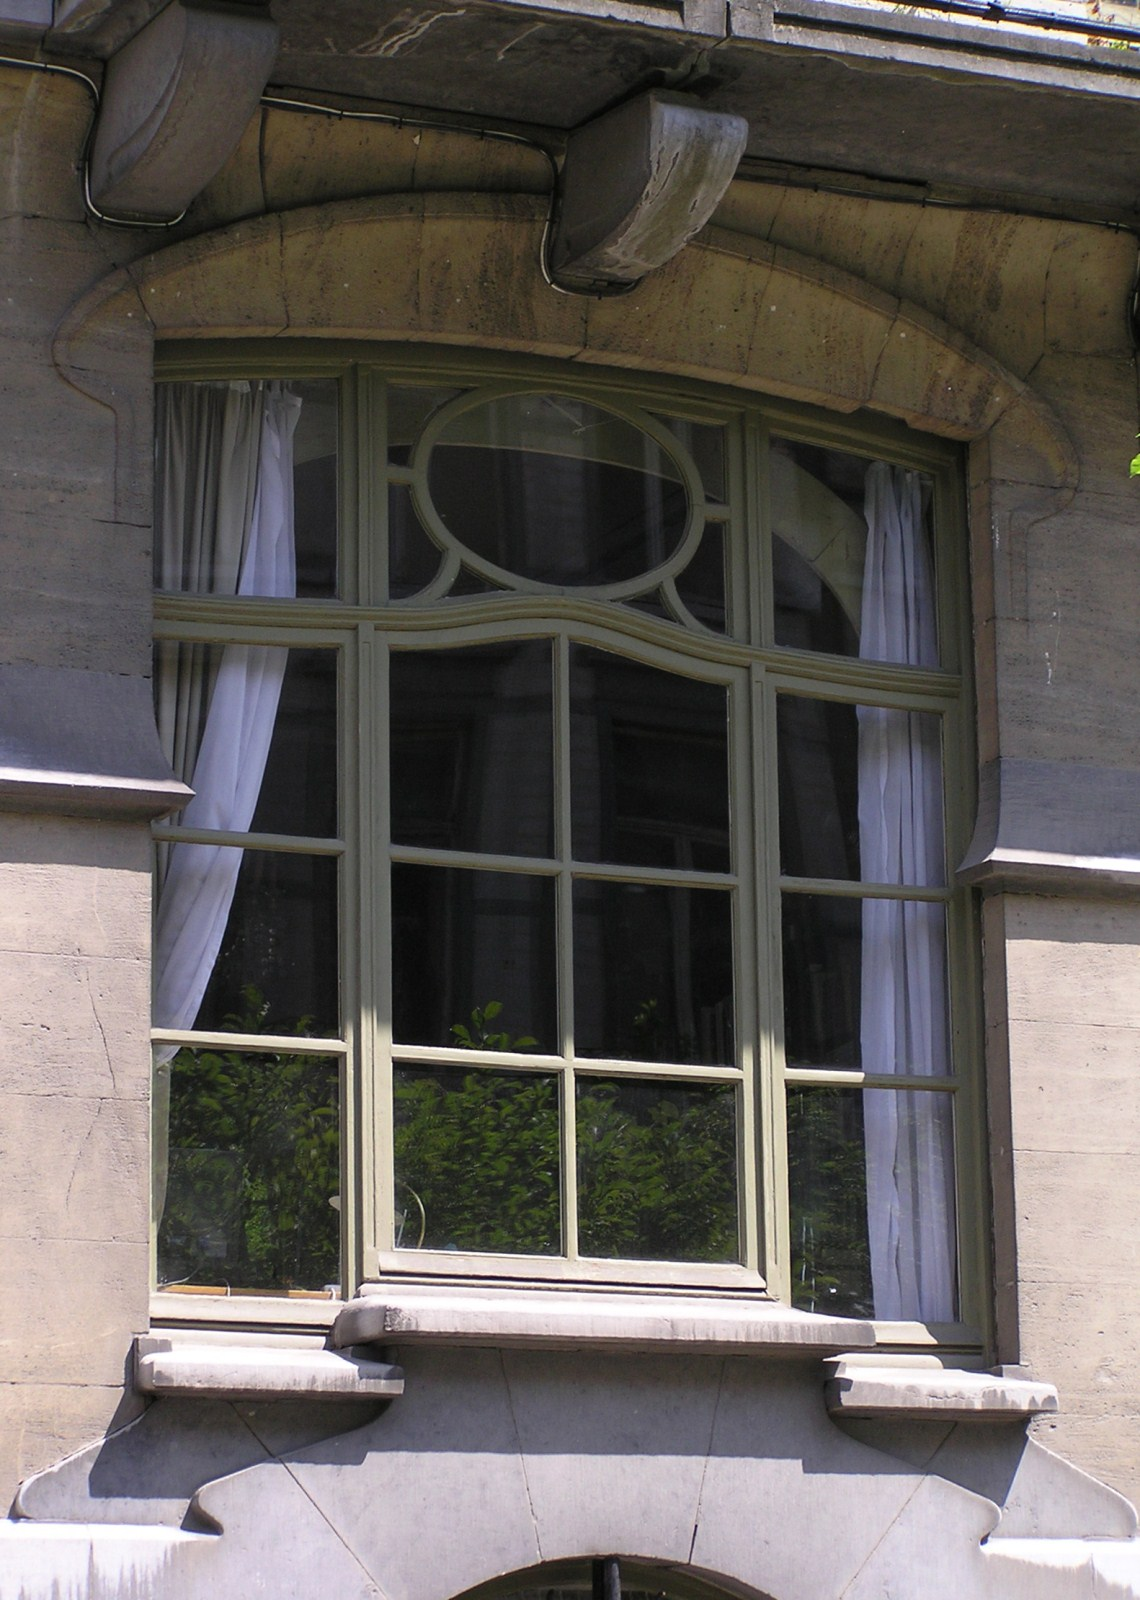 bruxelles extension est avenue michel ange 80 taelemans victor. Black Bedroom Furniture Sets. Home Design Ideas